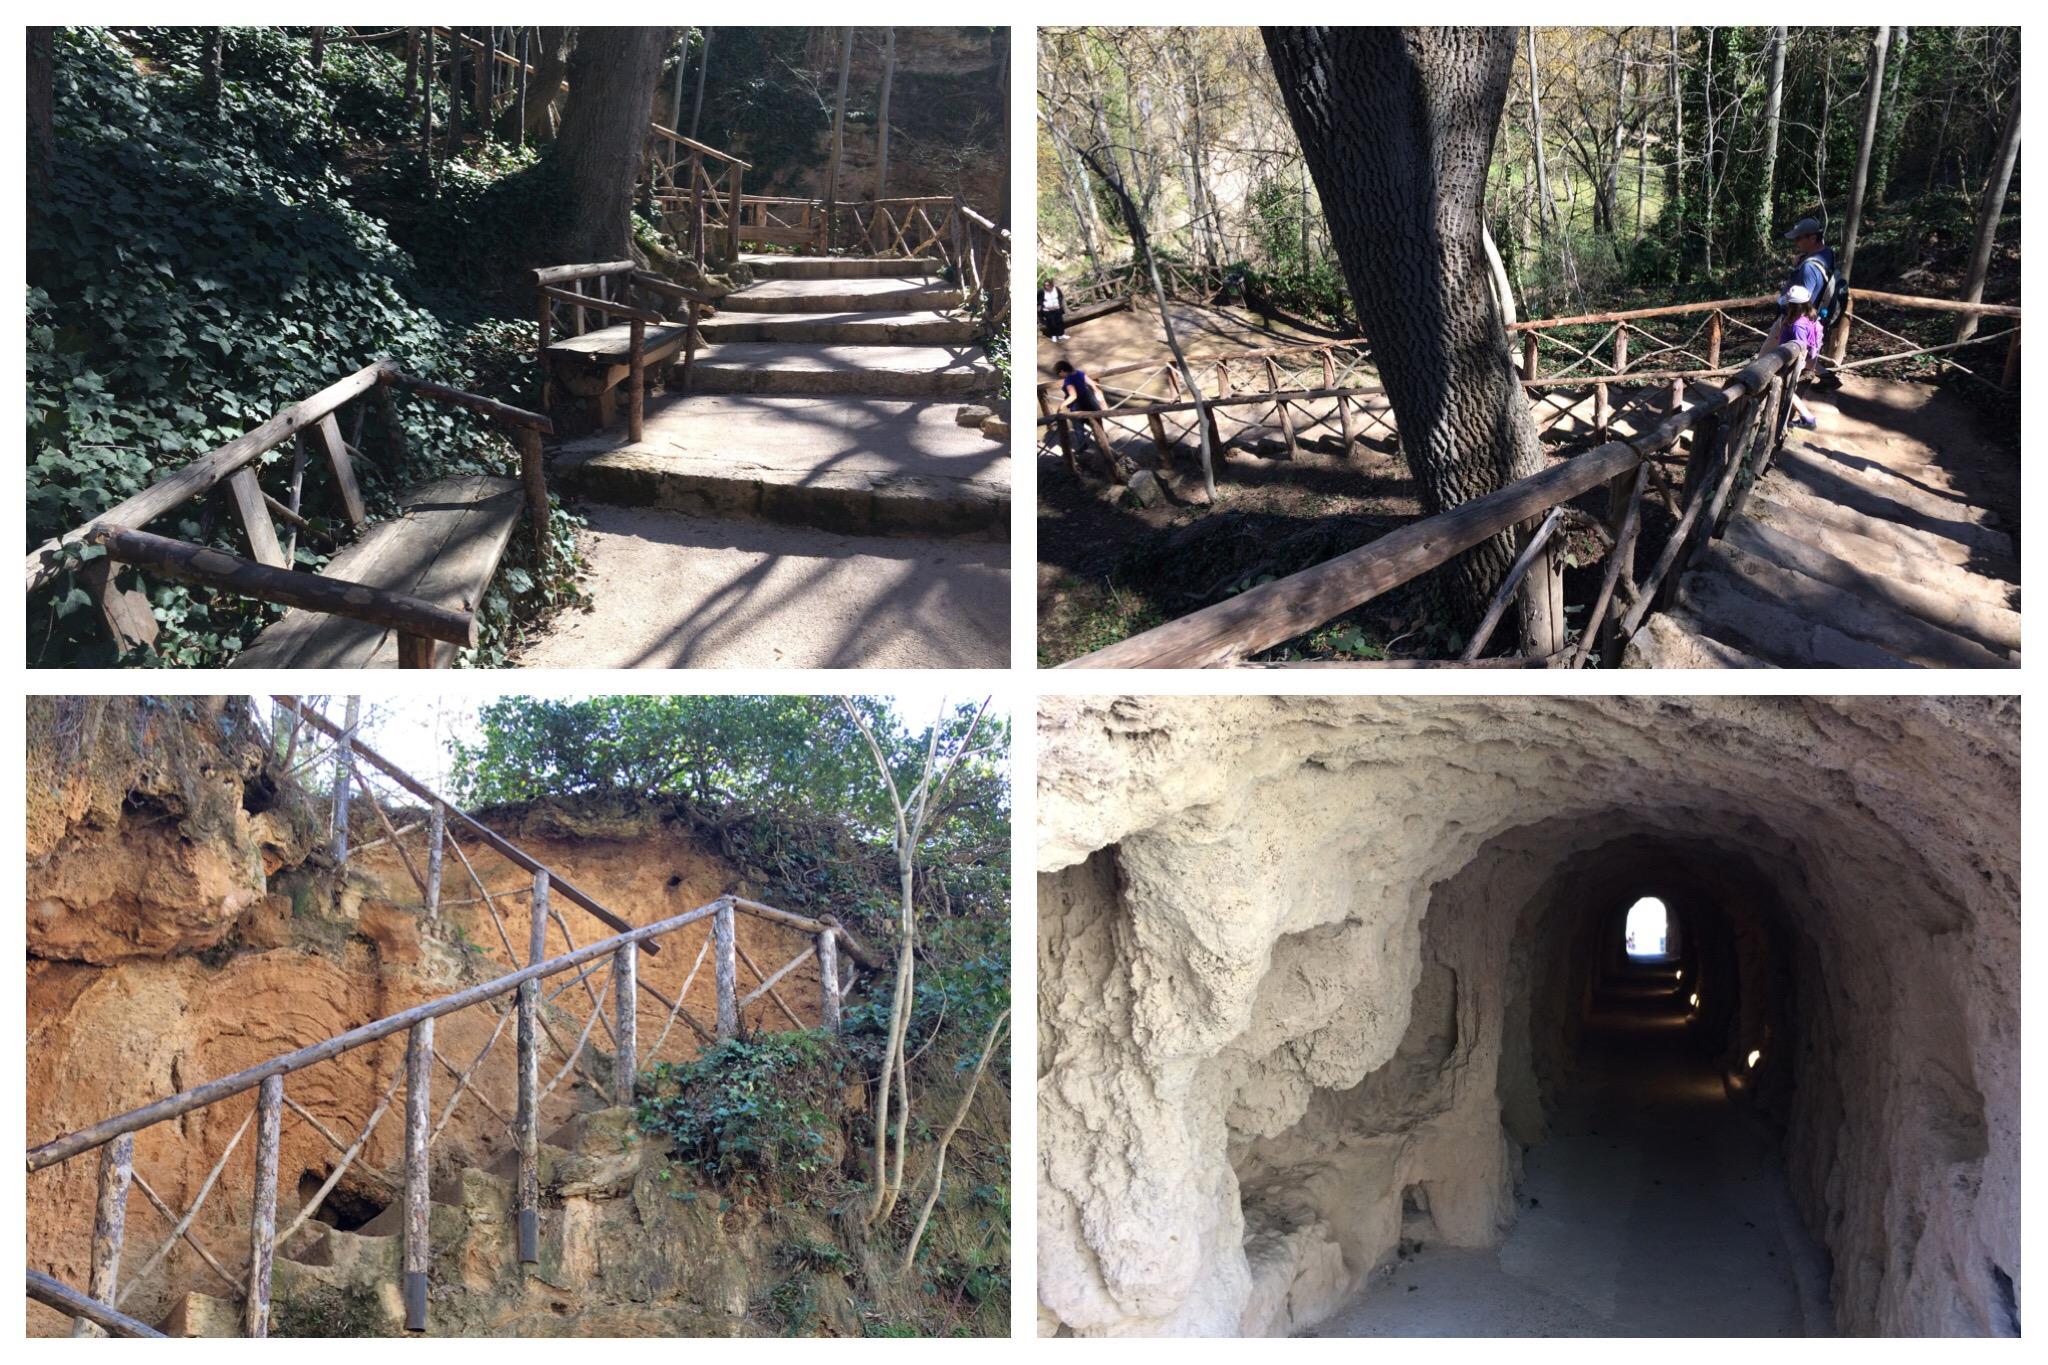 Monasterio de Piedra paths steps tunnels